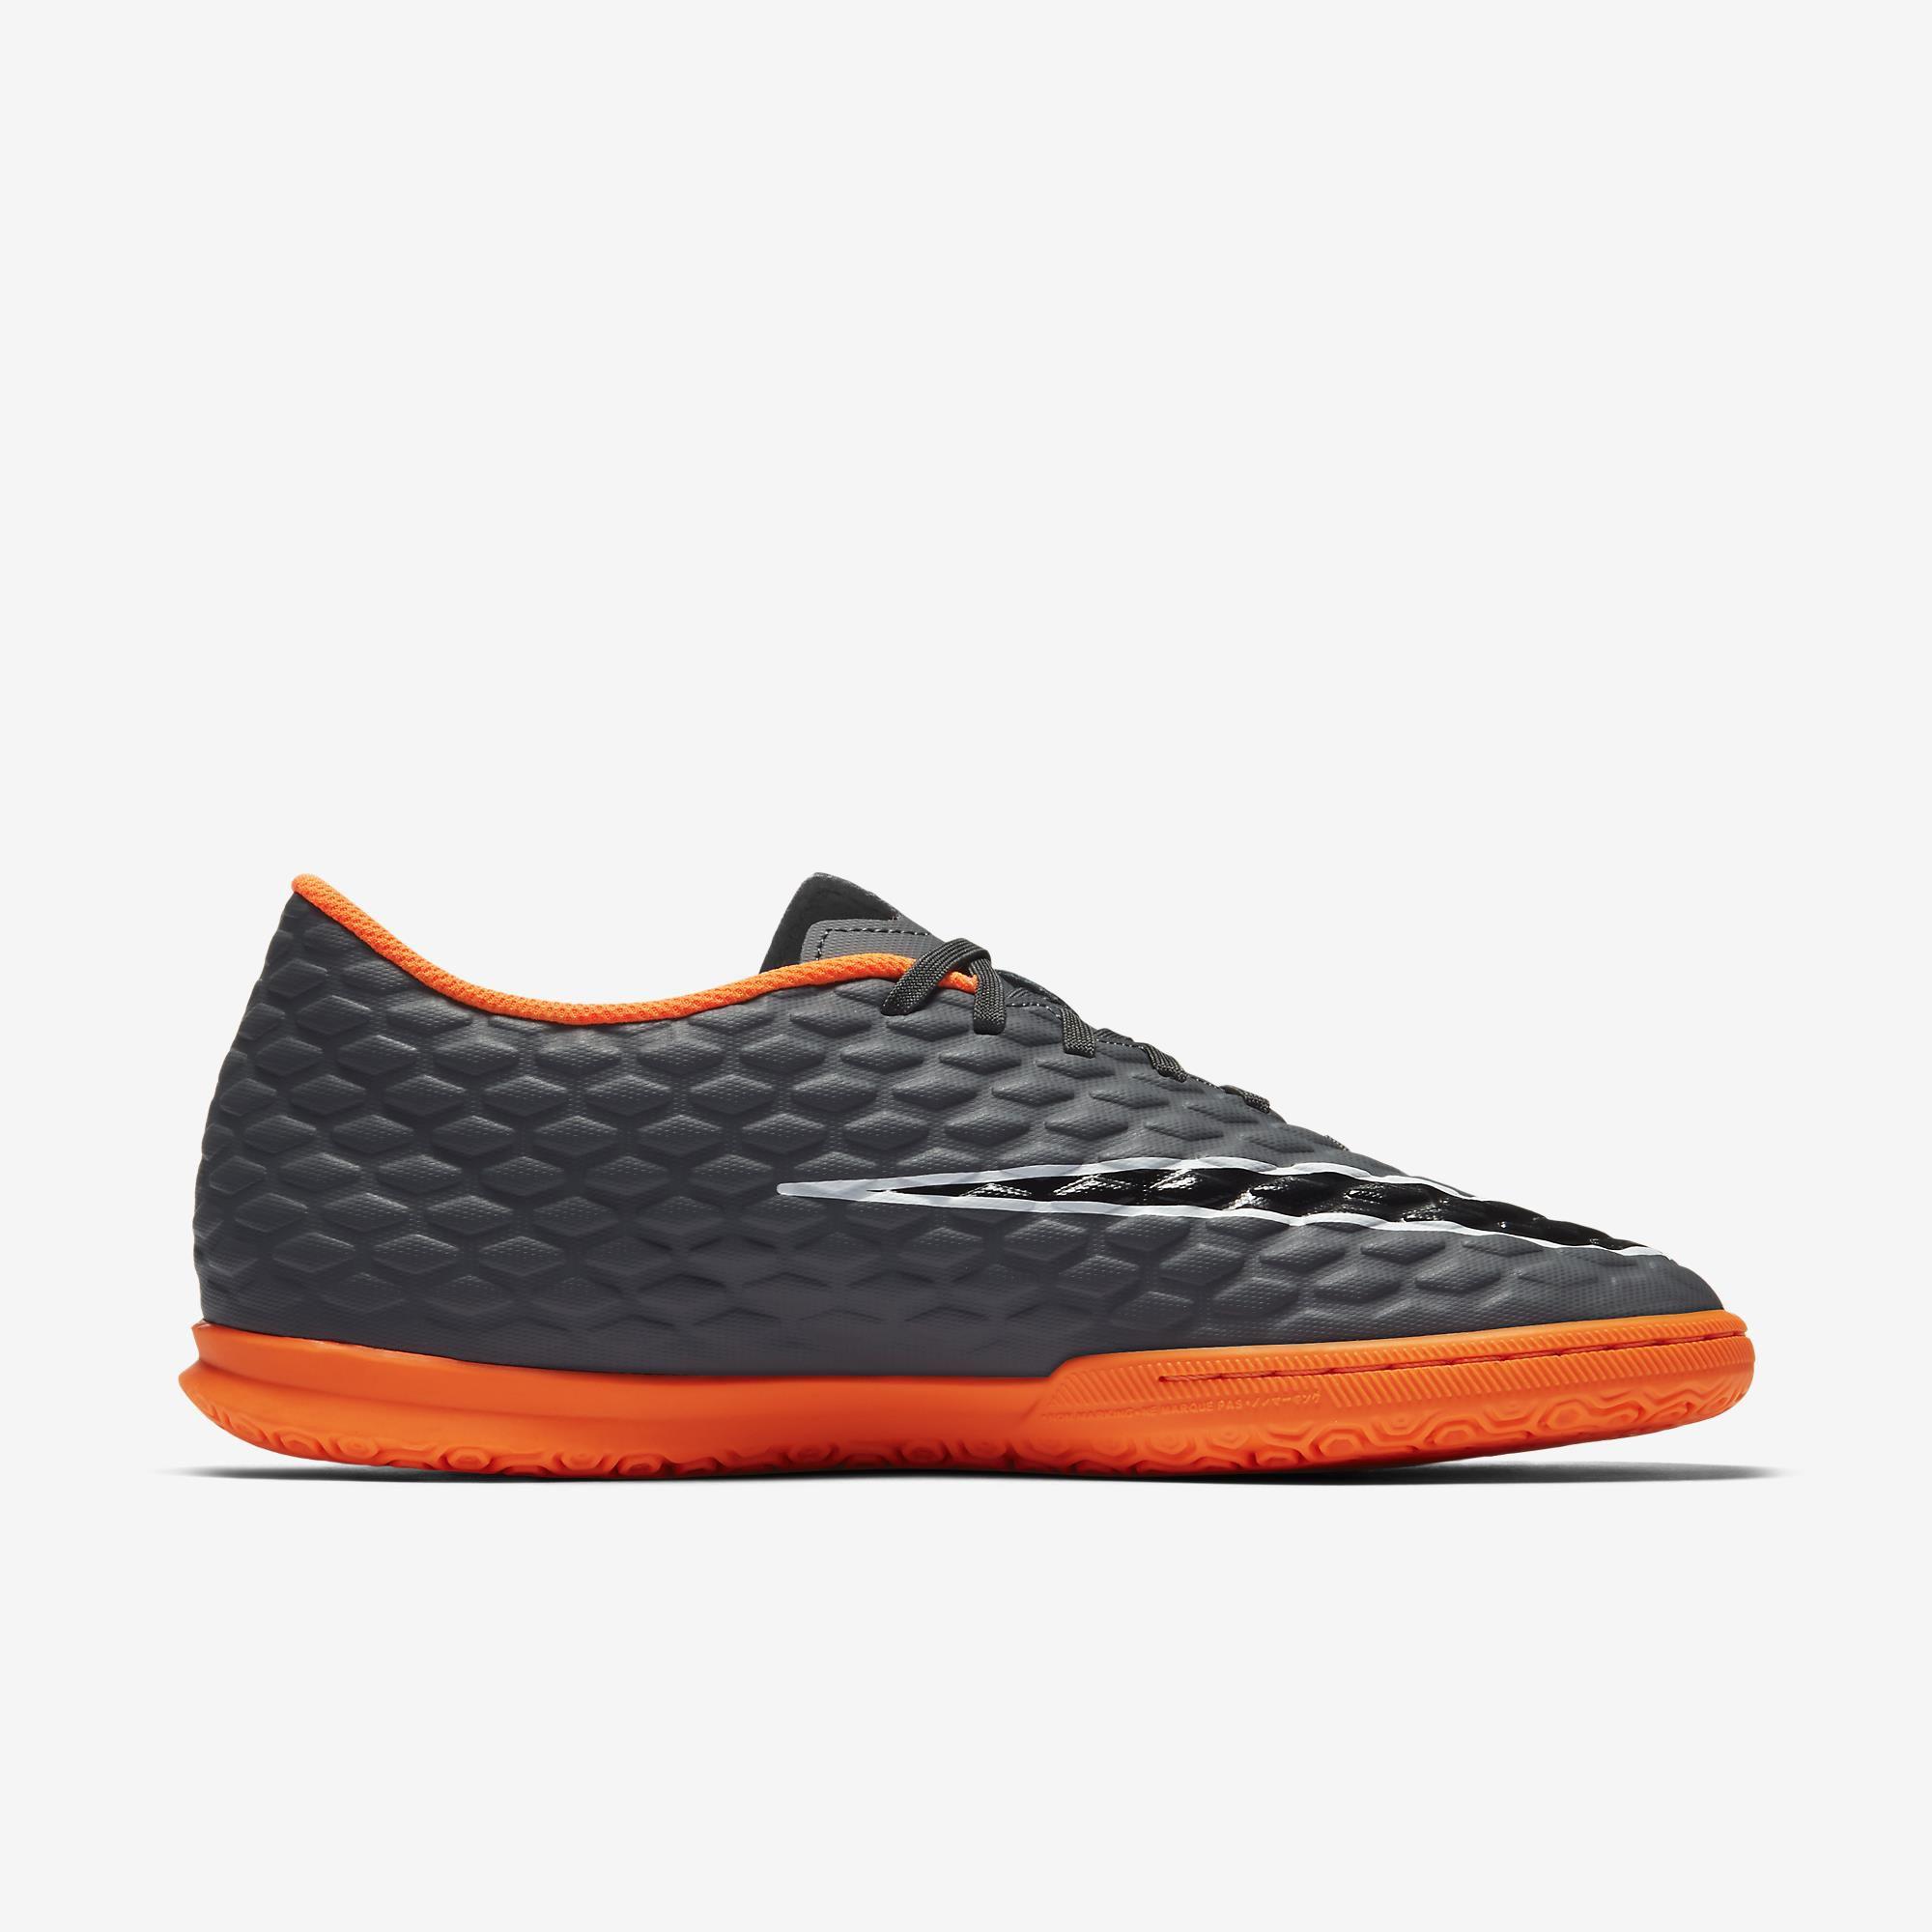 a048d92154 Chuteira Nike Hypervenom Phantomx 3 Cl Futsal - BRACIA SHOP  Loja de ...